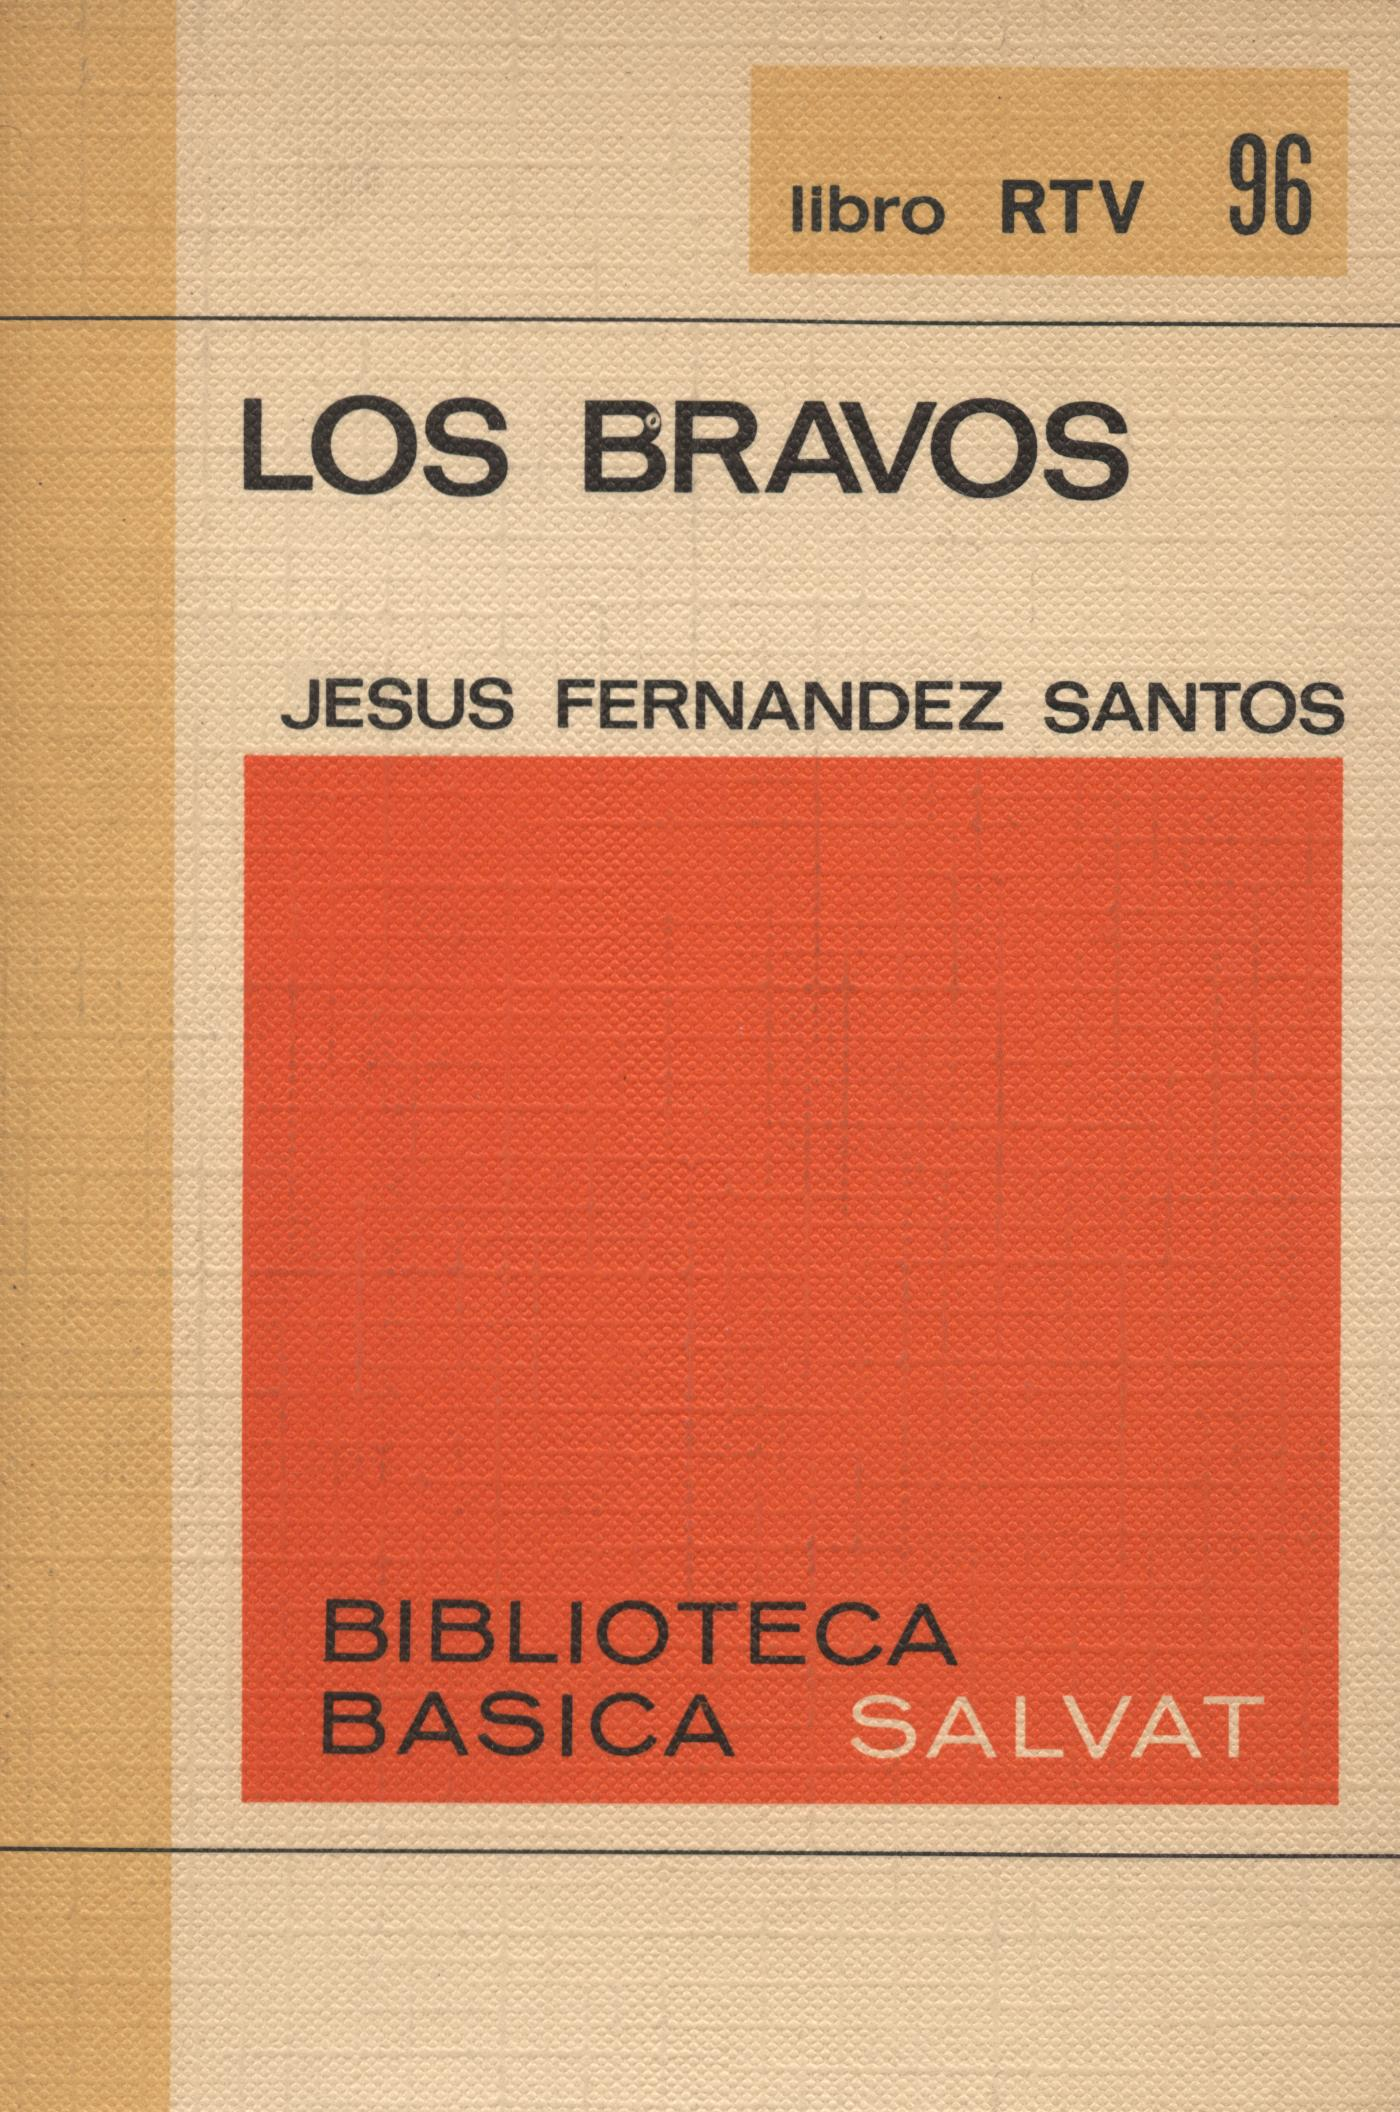 Los bravos - Jesús Fernandez Santos